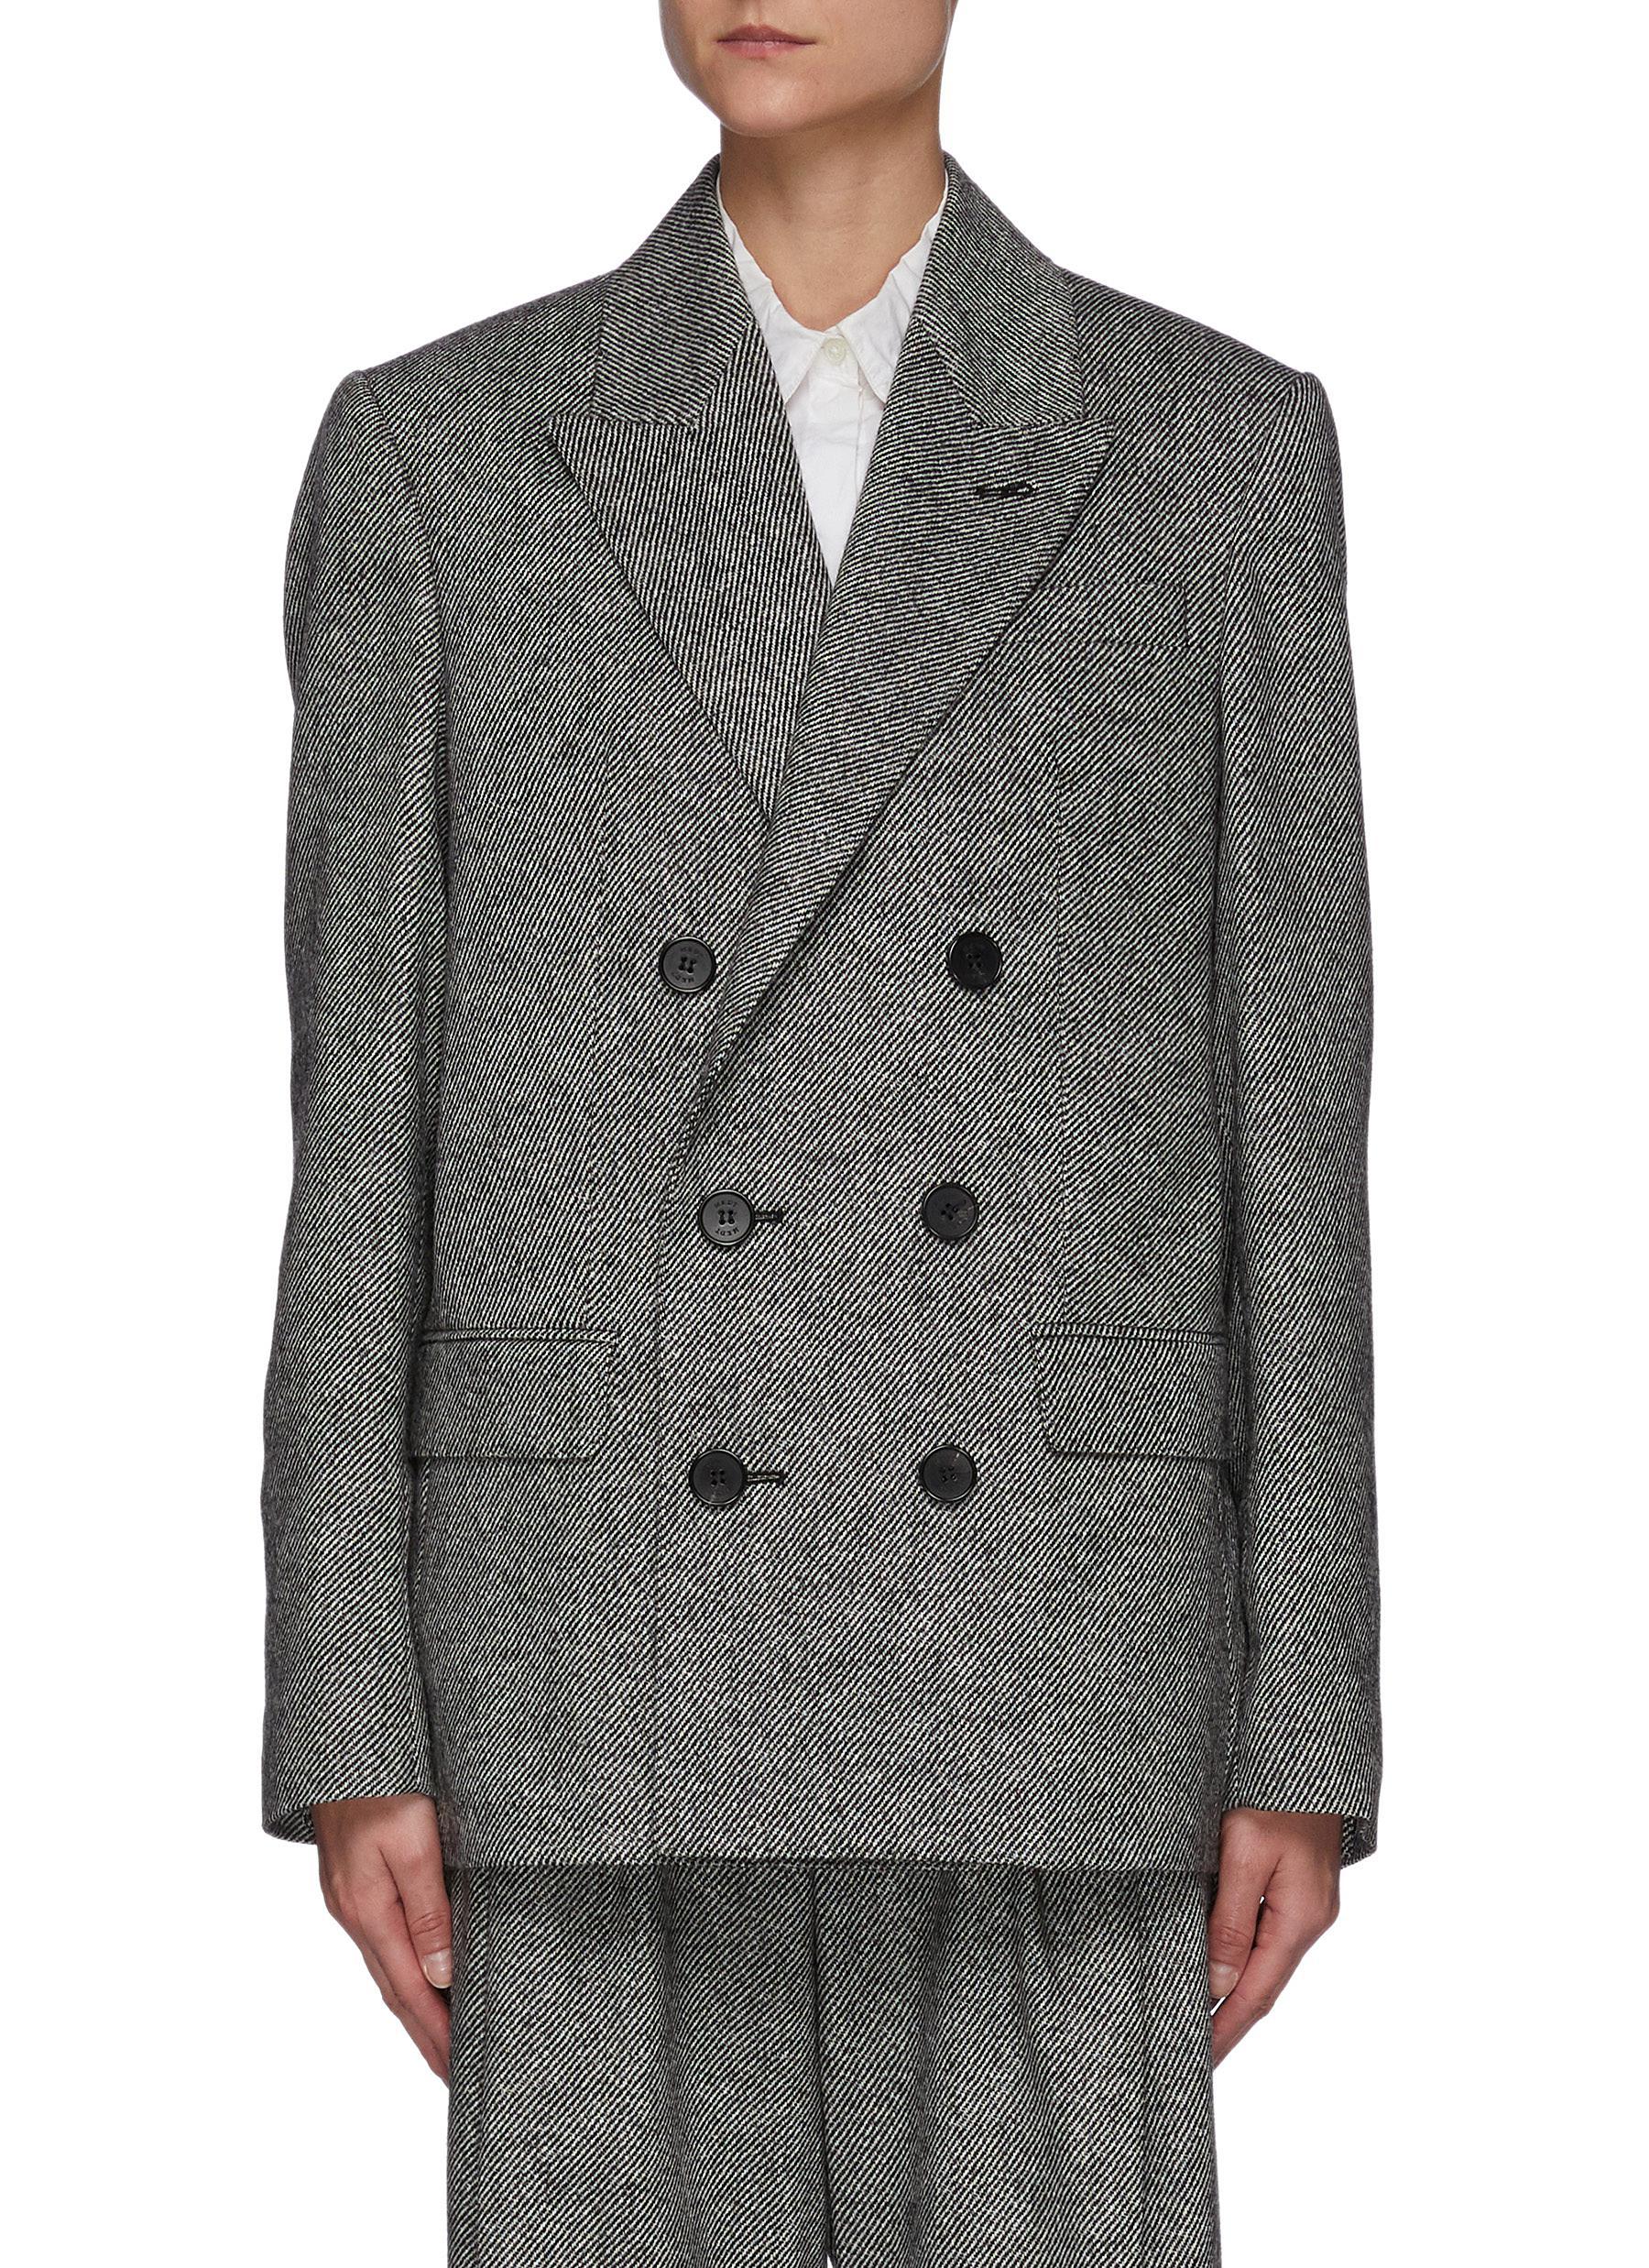 Jacob' Melange Wool Twill Blazer